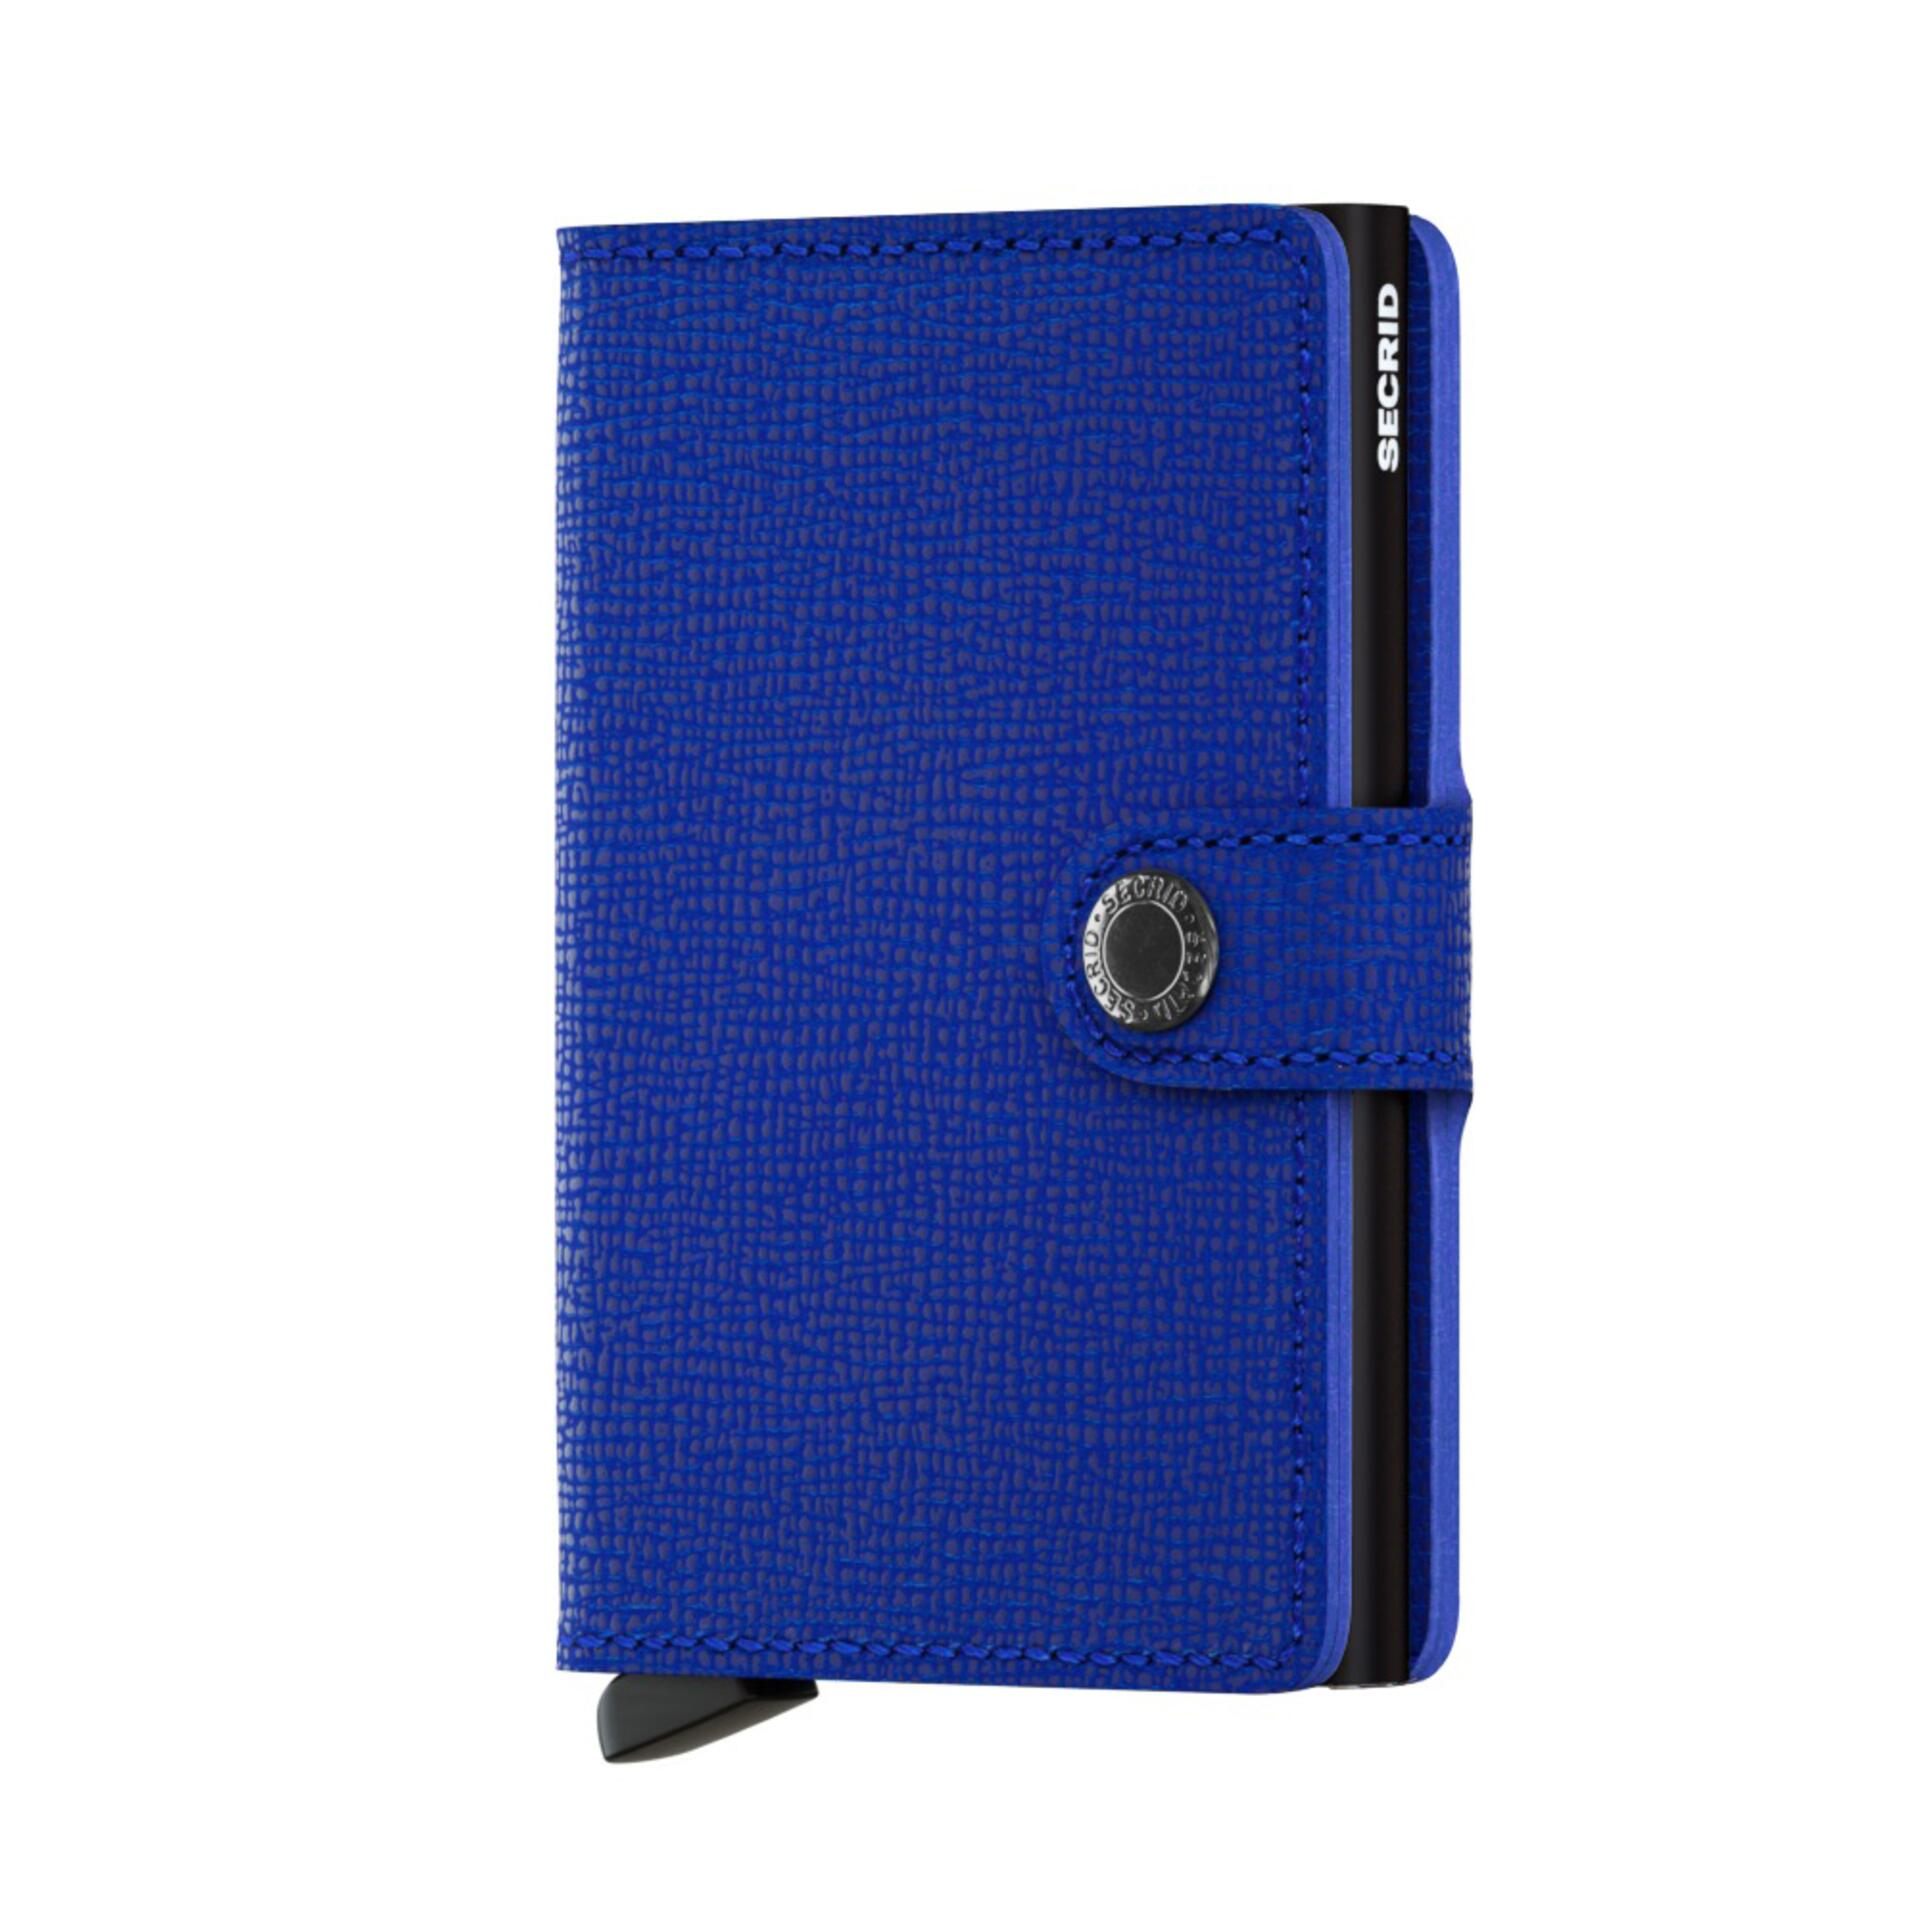 Secrid Miniwallet Crisple Blue Black